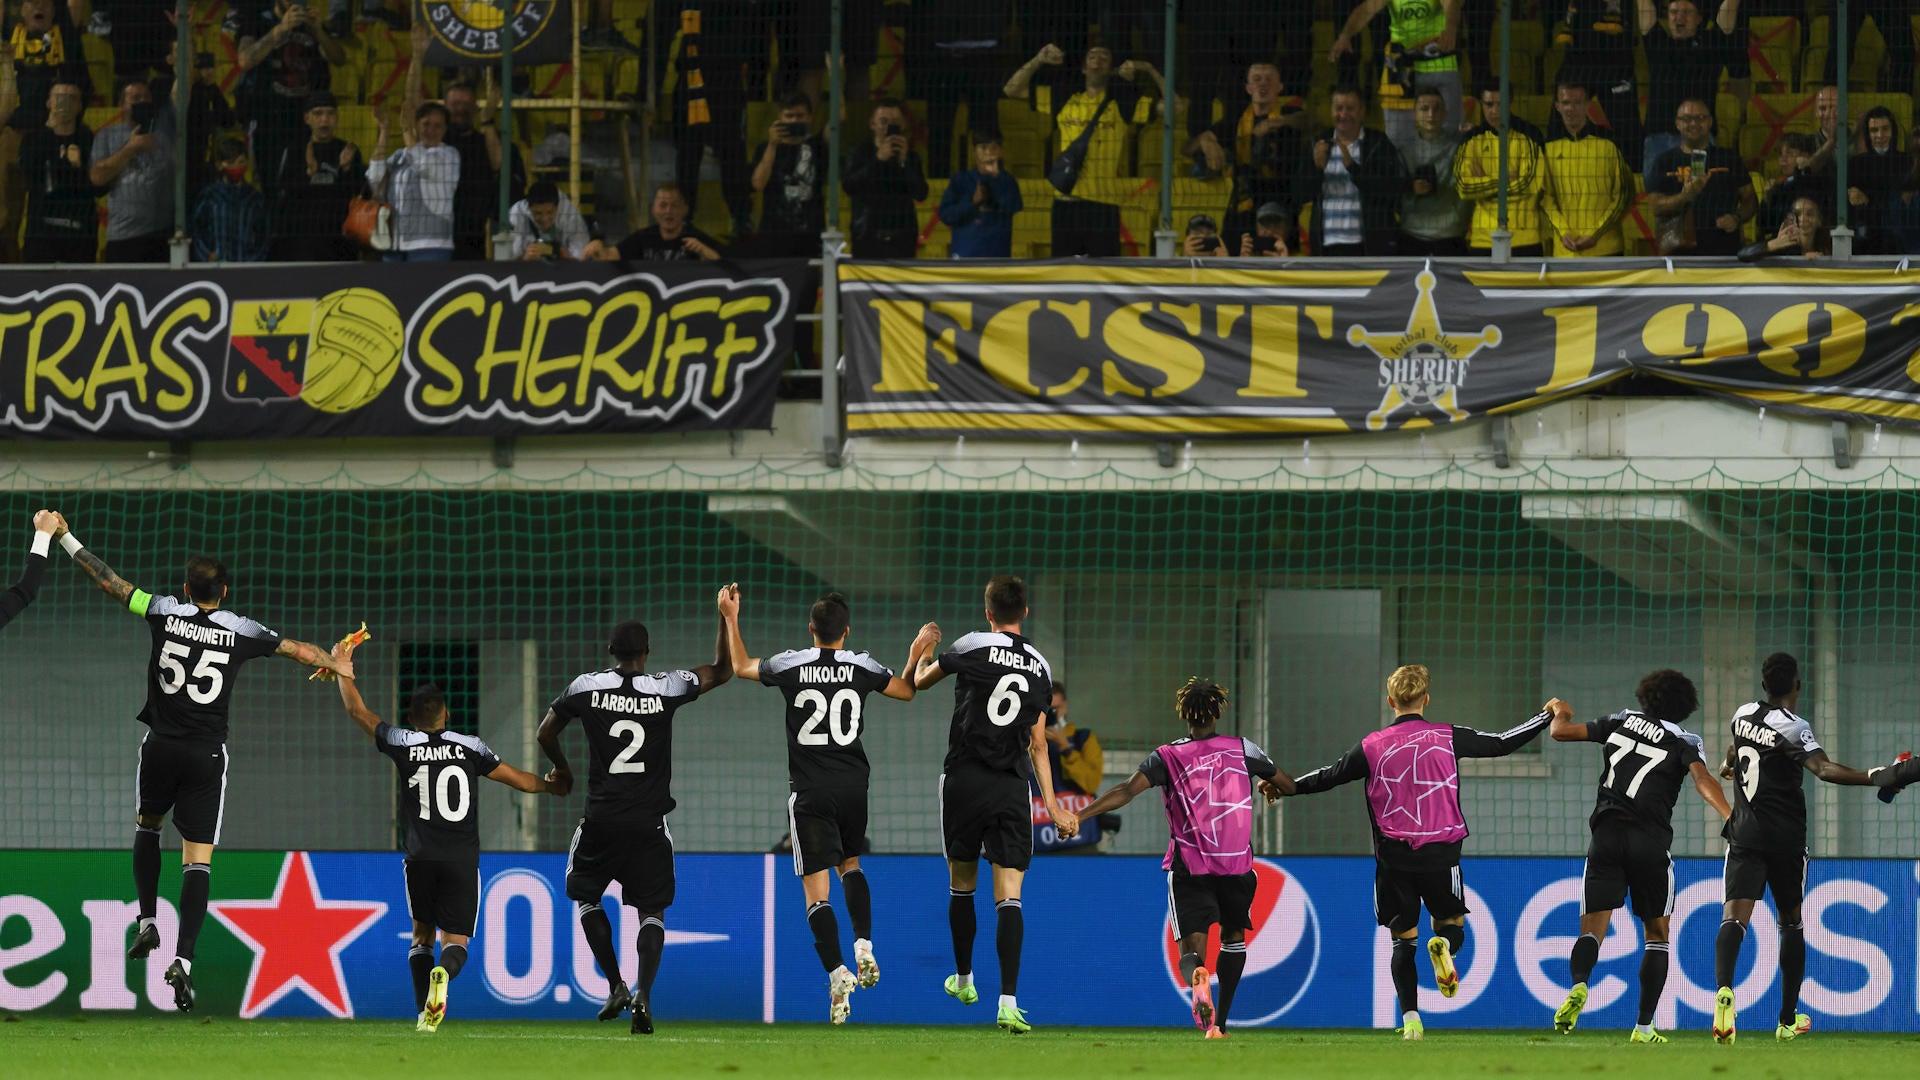 Champions League Highlights: FC Sheriff vs. Shakhtar Donetsk - CBSSports.com